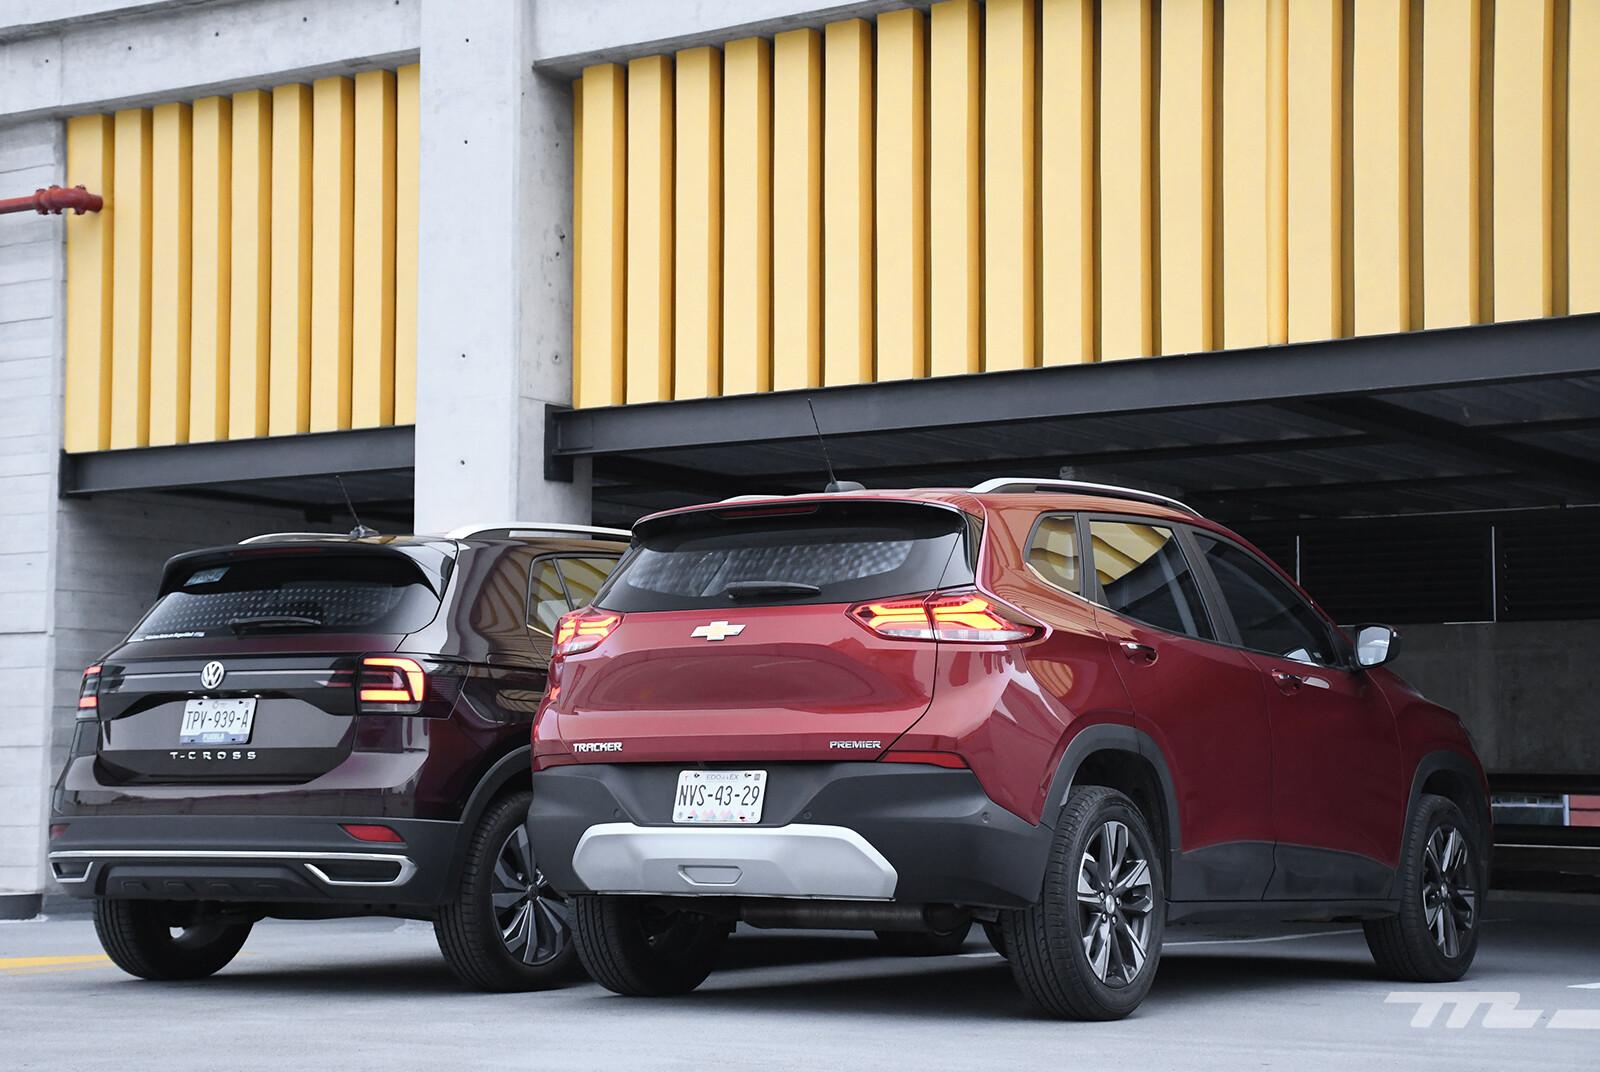 Foto de Chevrolet Tracker vs. Volkswagen T-Cross (comparativa) (7/29)